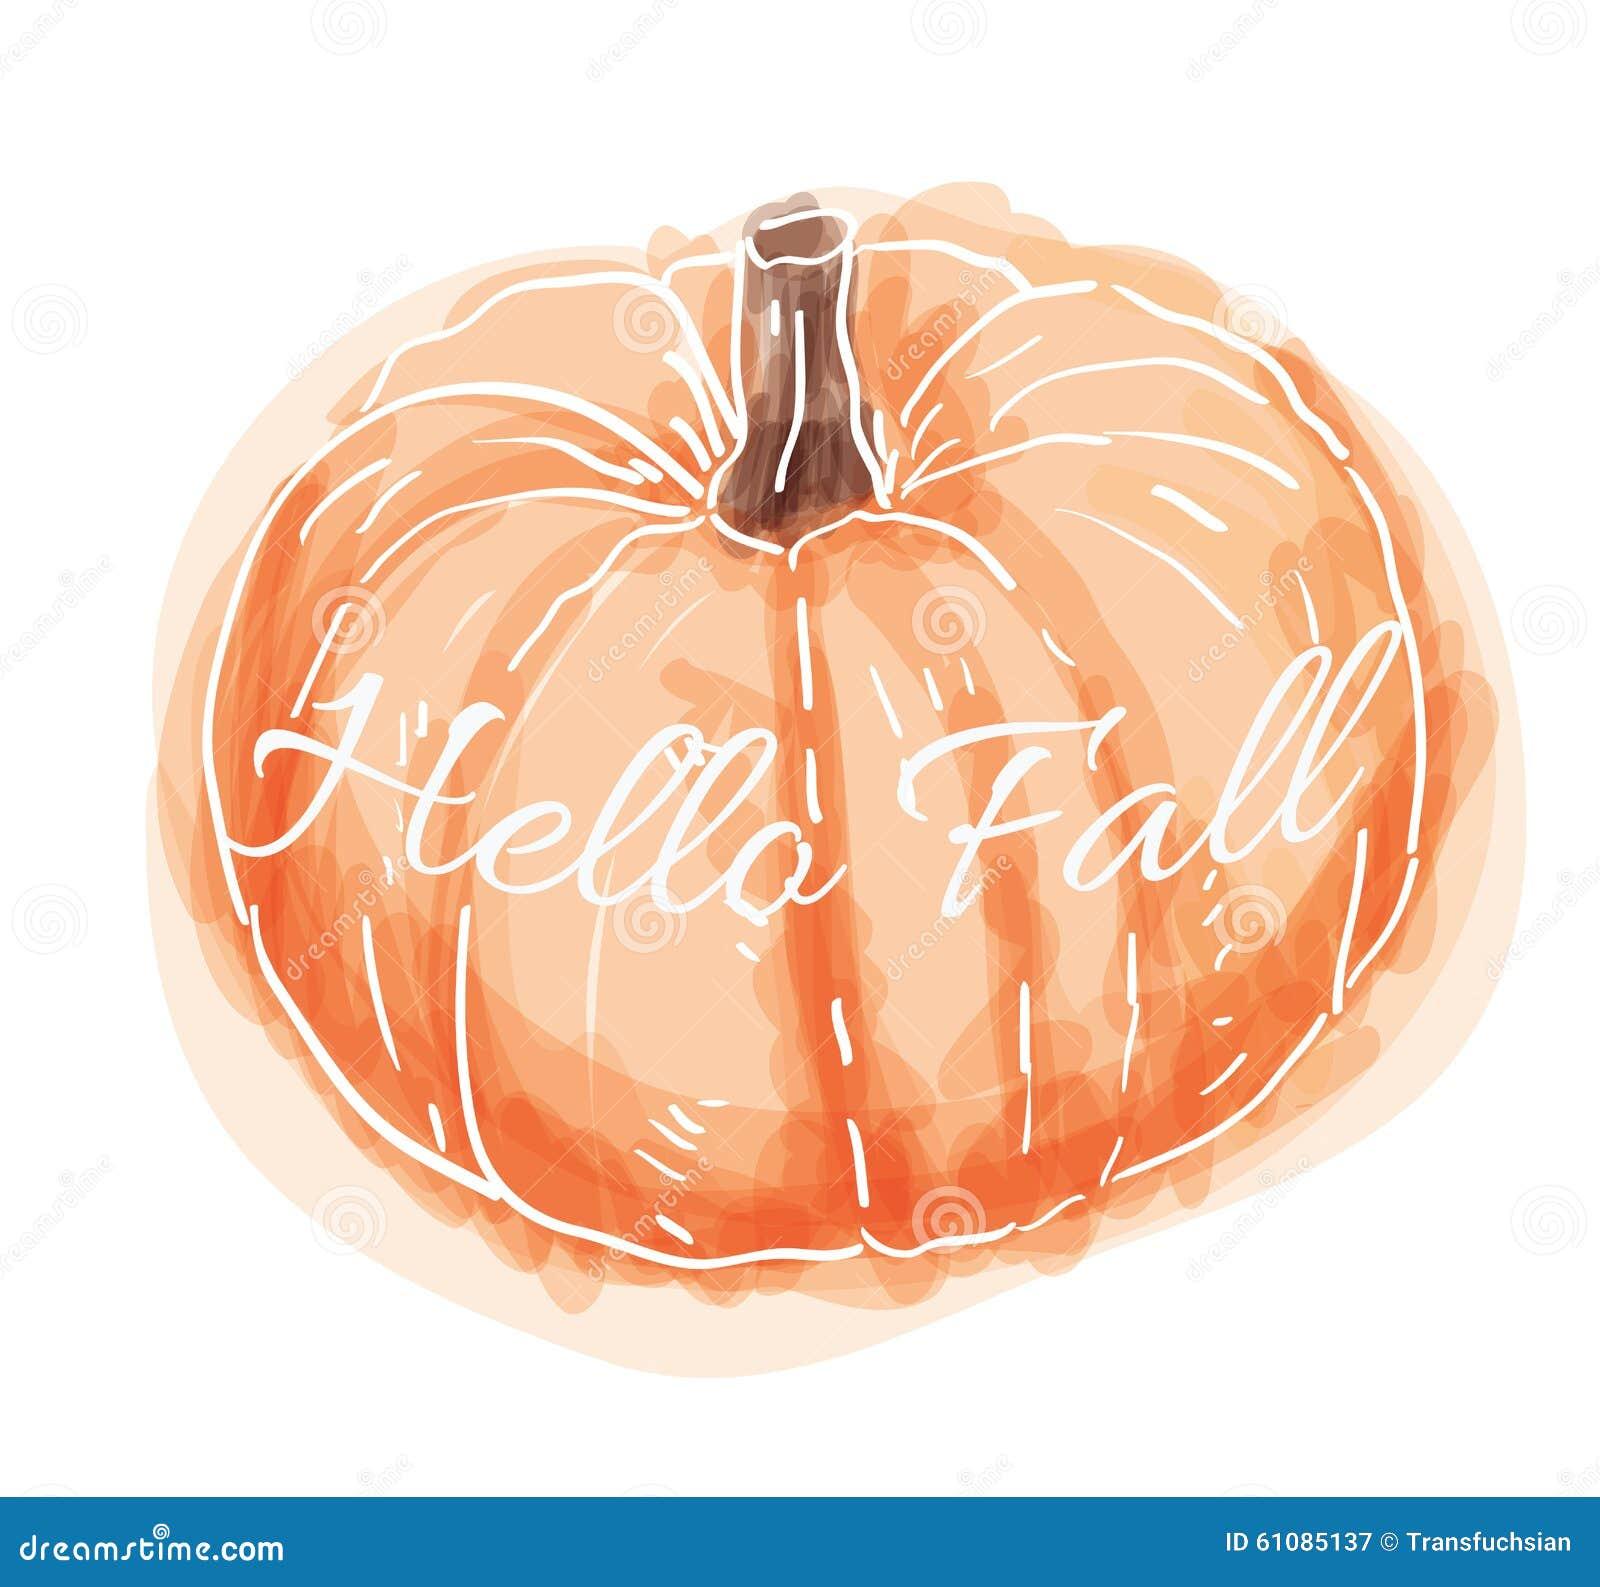 Hand Drawn Watercolor Pumpkin